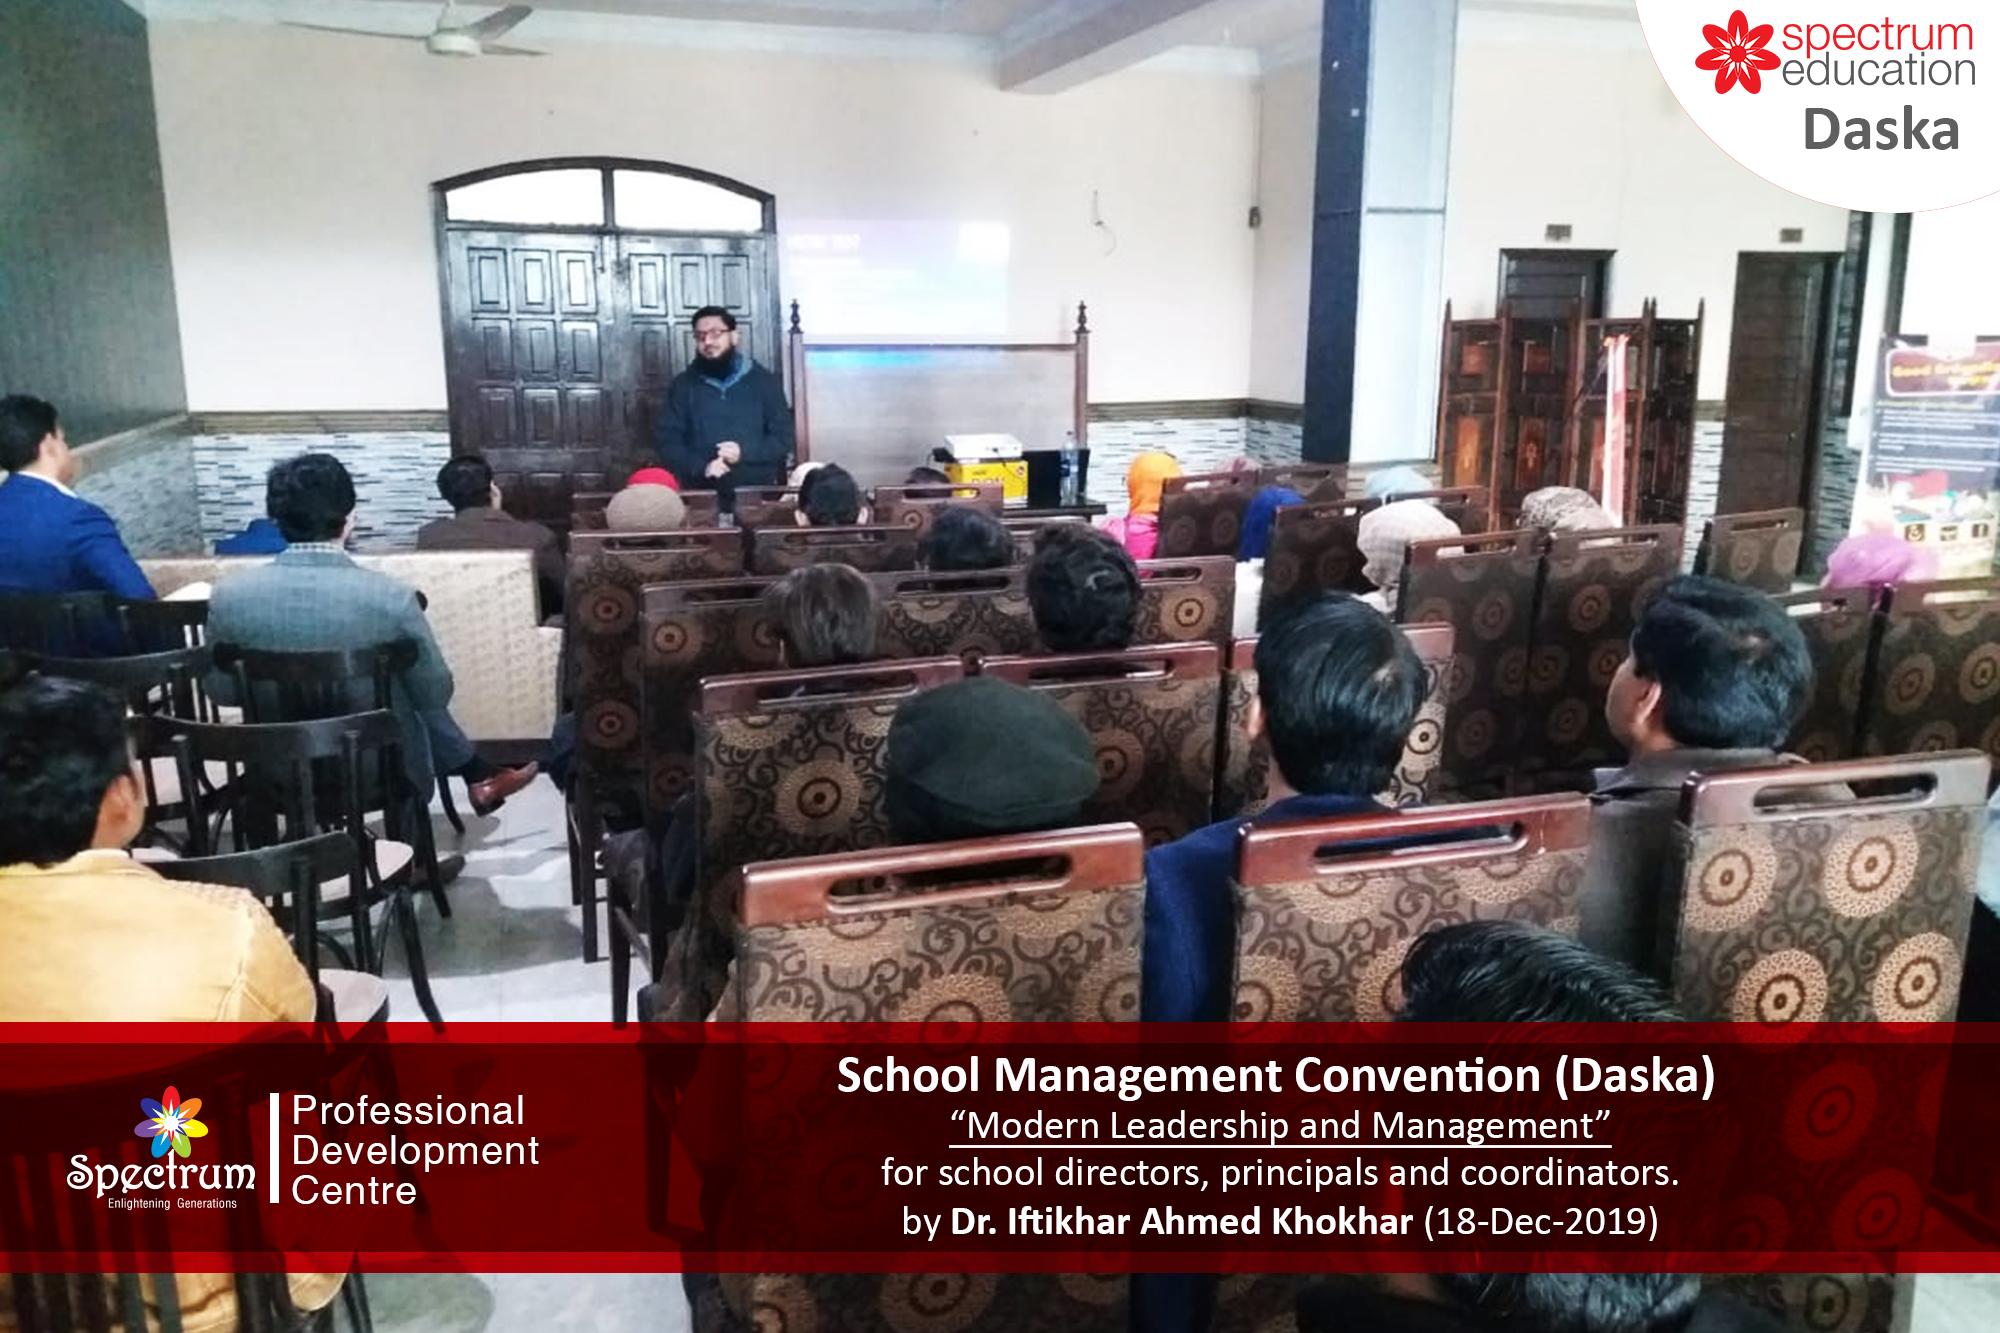 Spectrum Professional Development Center (Daska)